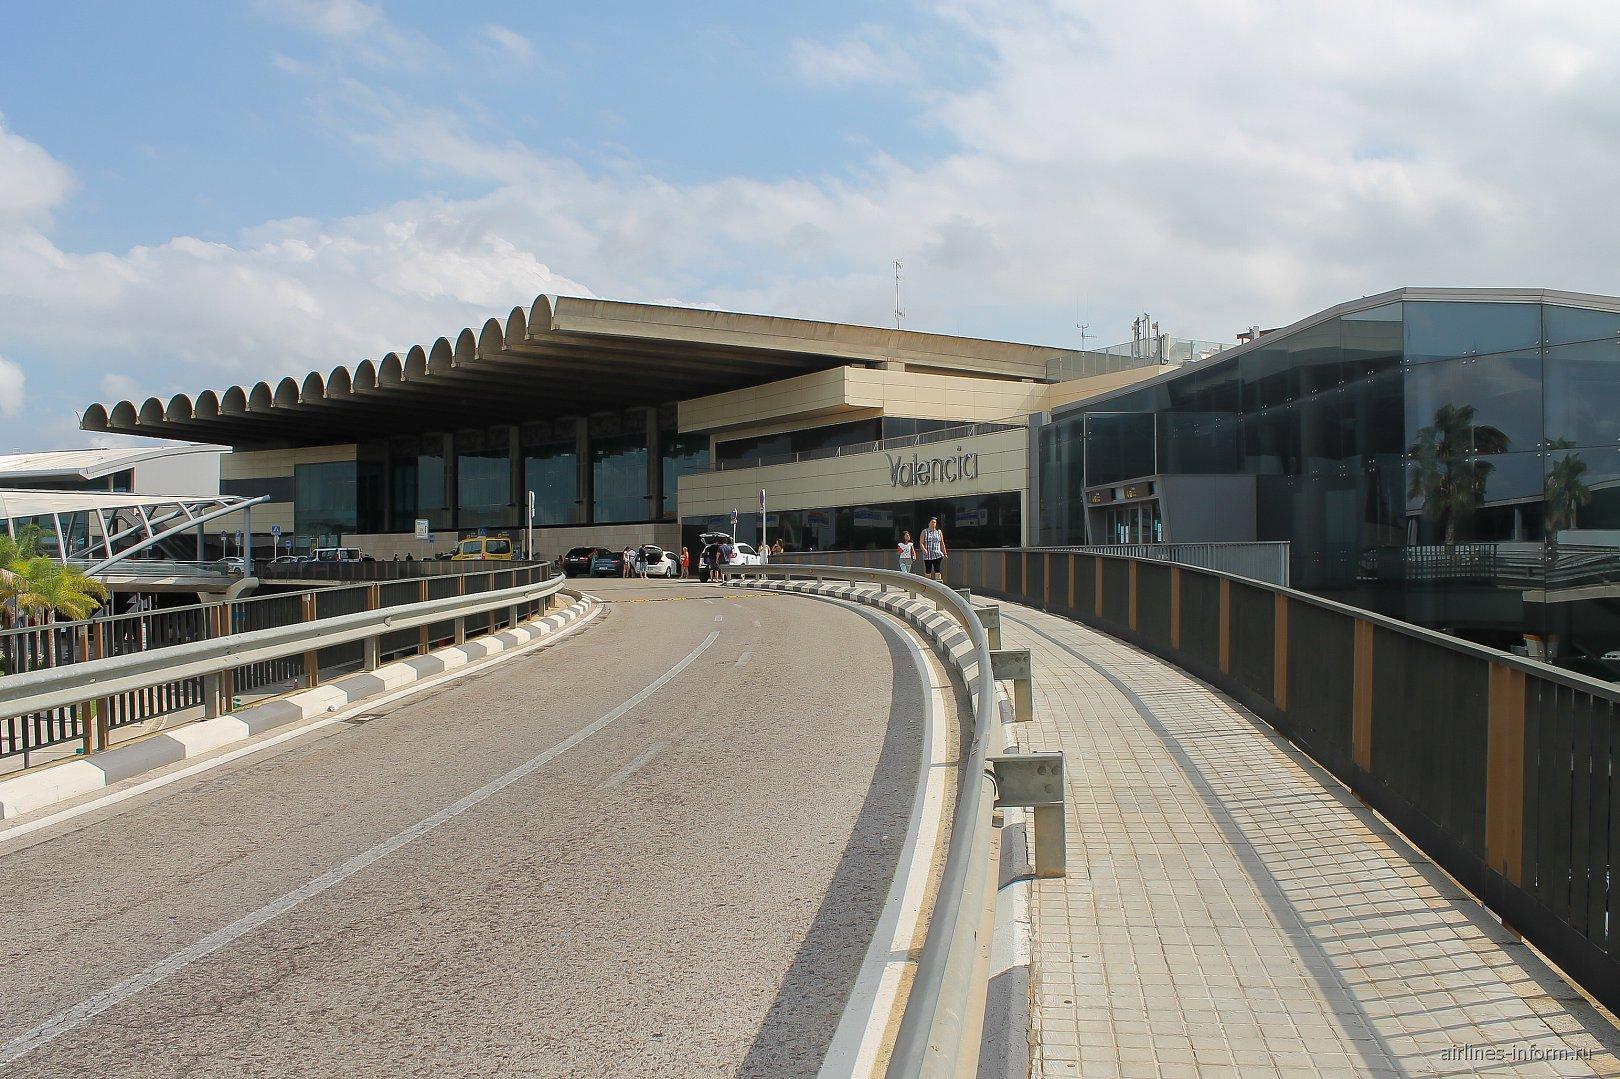 Пассажирский терминал аэропорта Валенсия